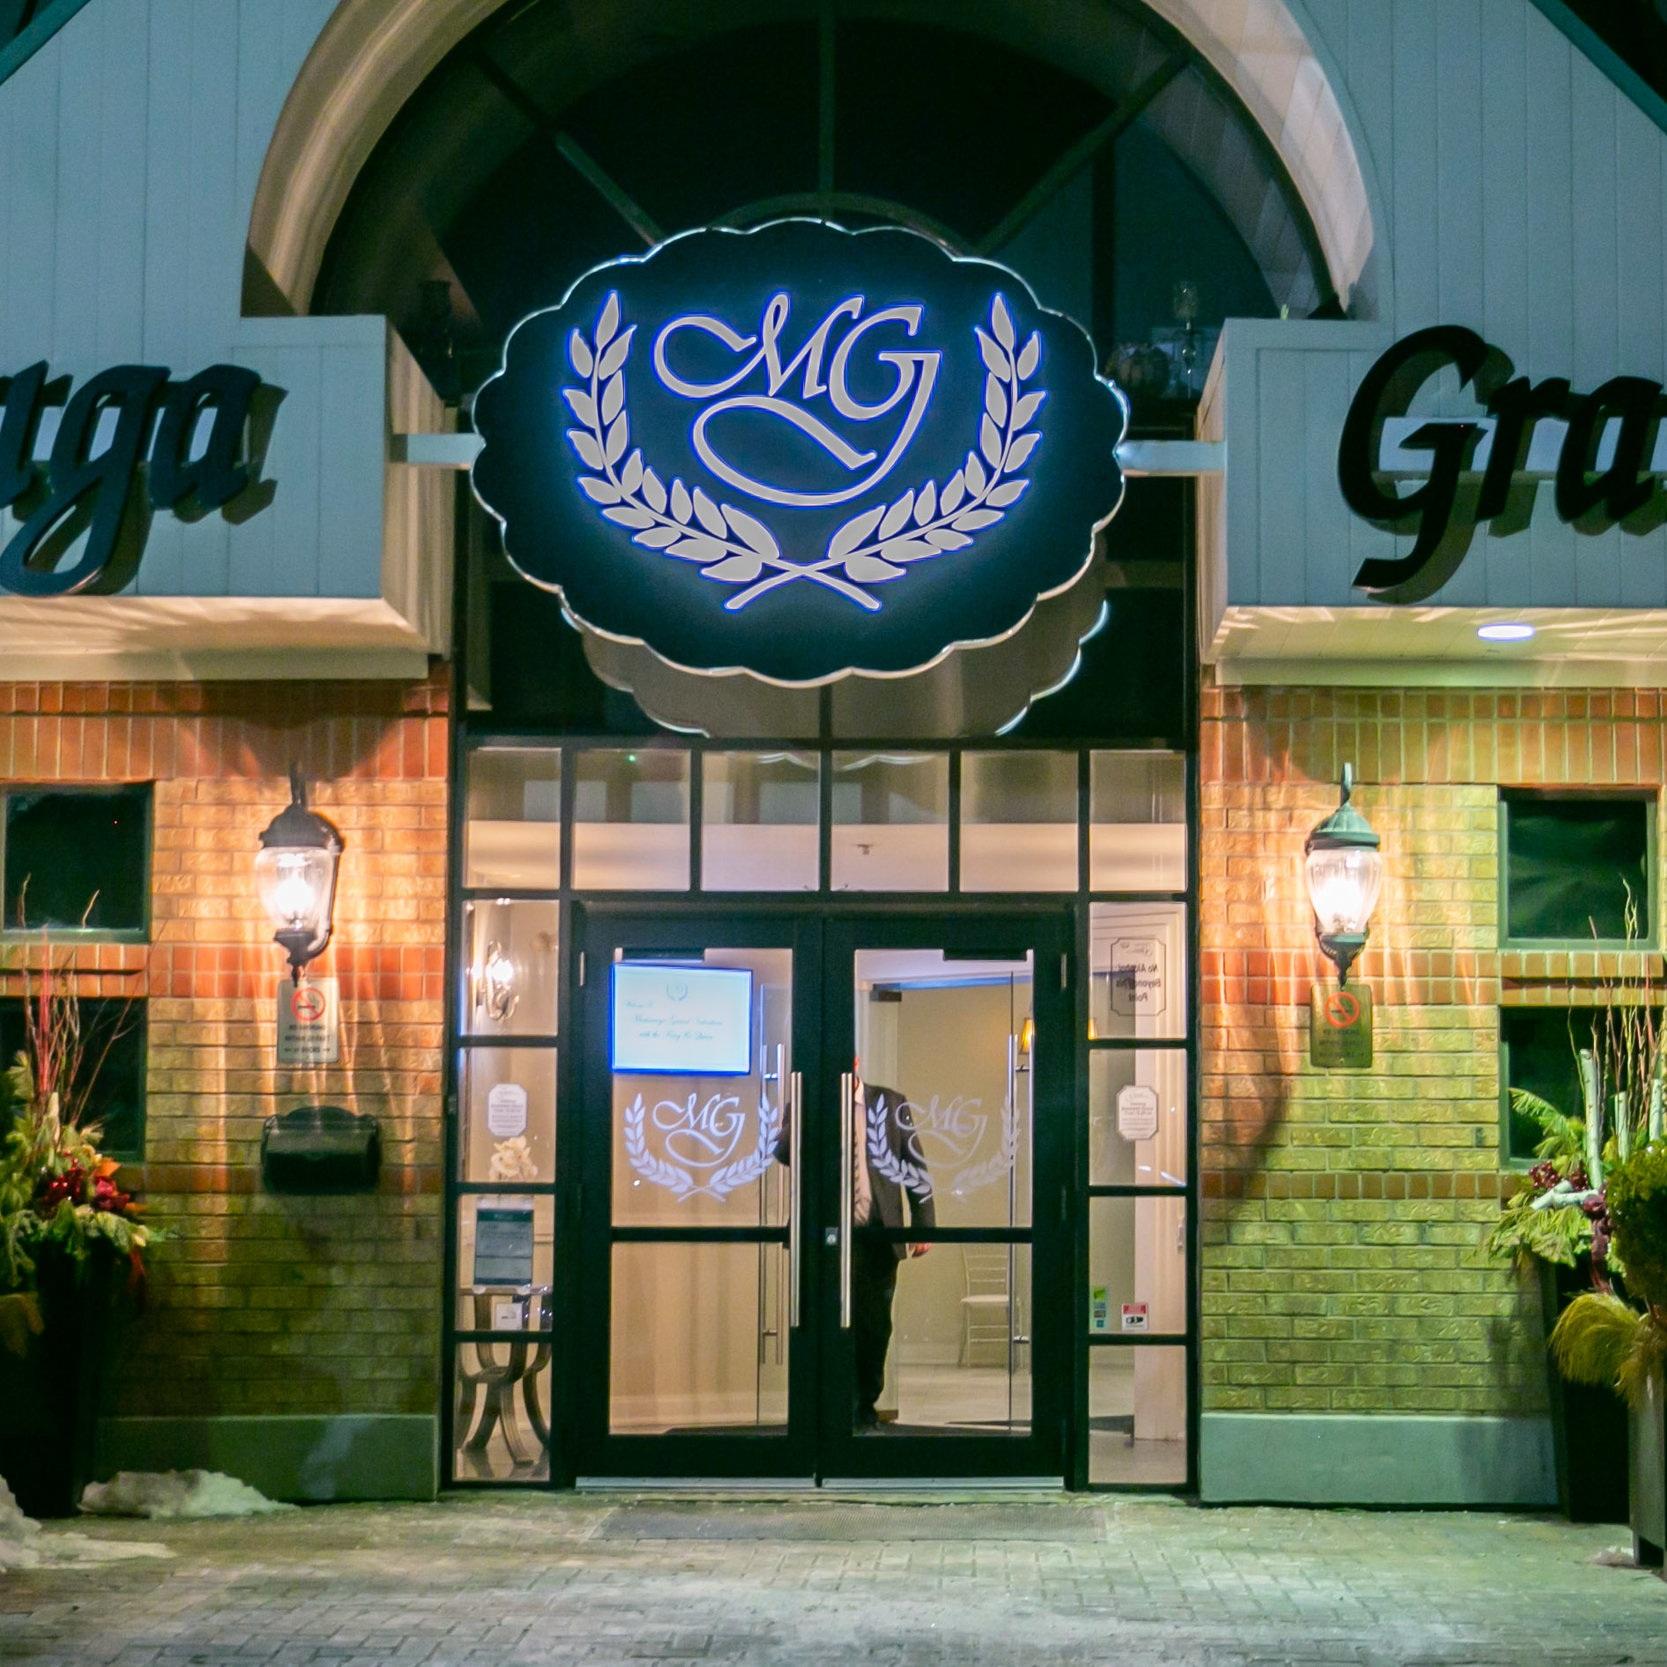 weddings-corporate-event-events-venue-venues-mississauga-banquet-hall-halls-reception